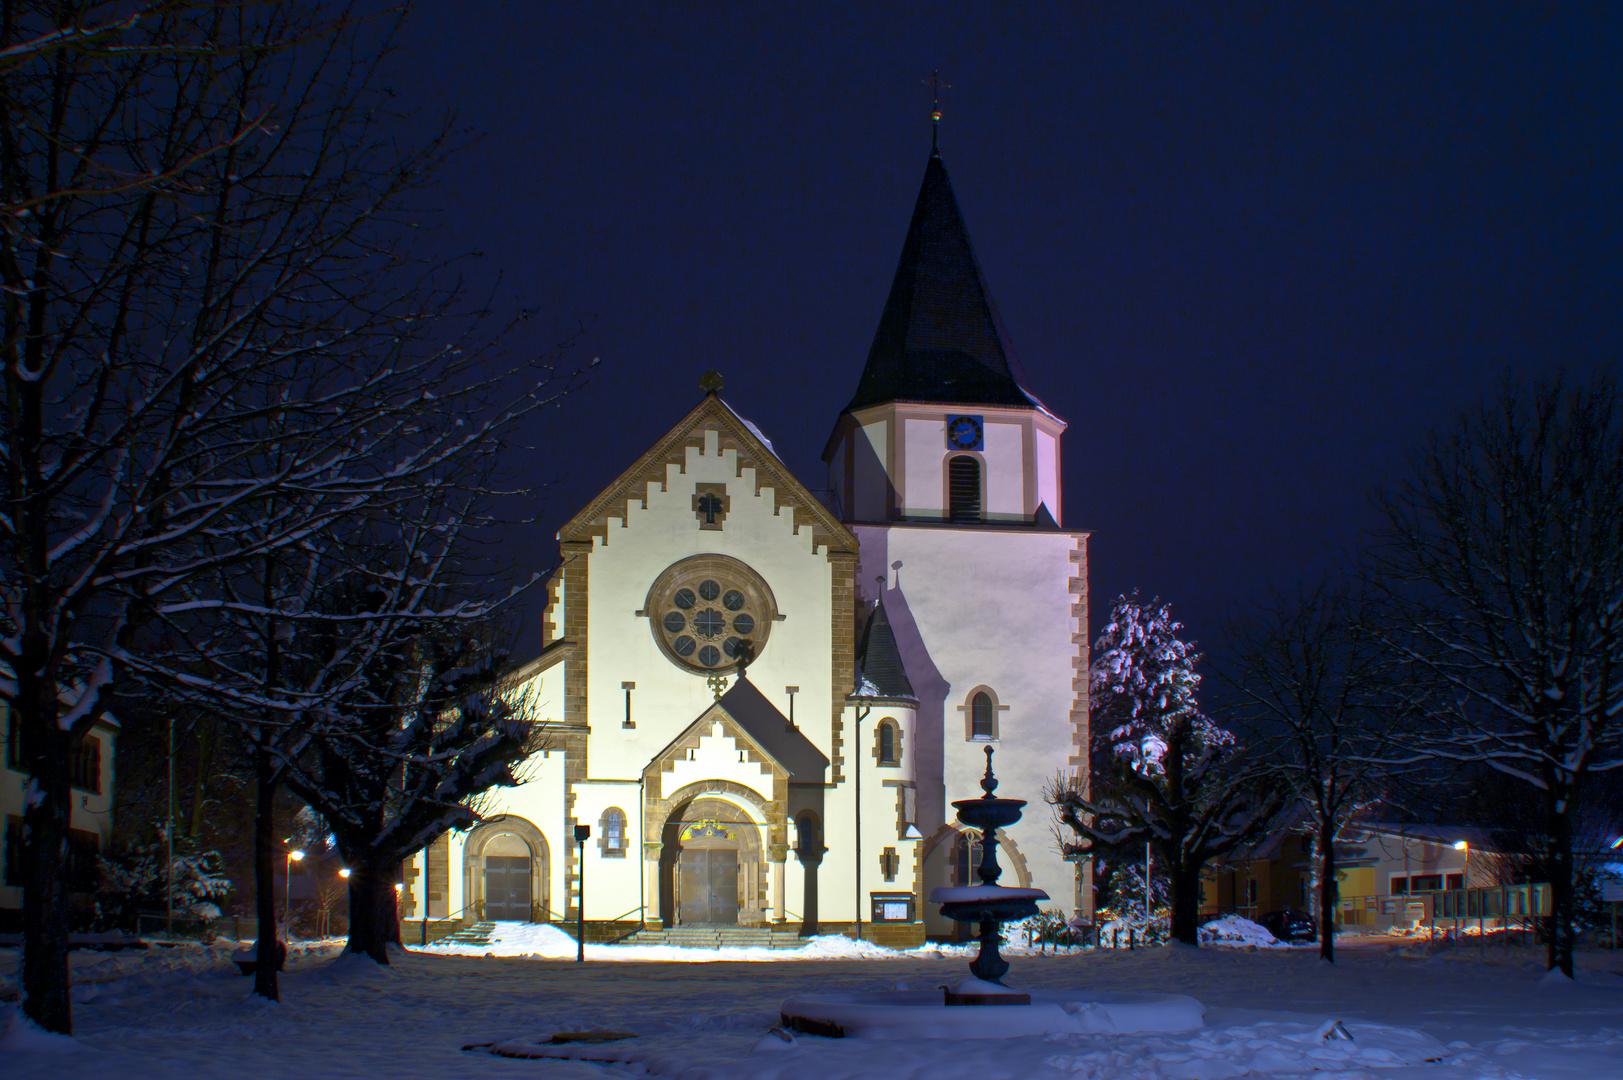 Kath. Kirche Oberachern